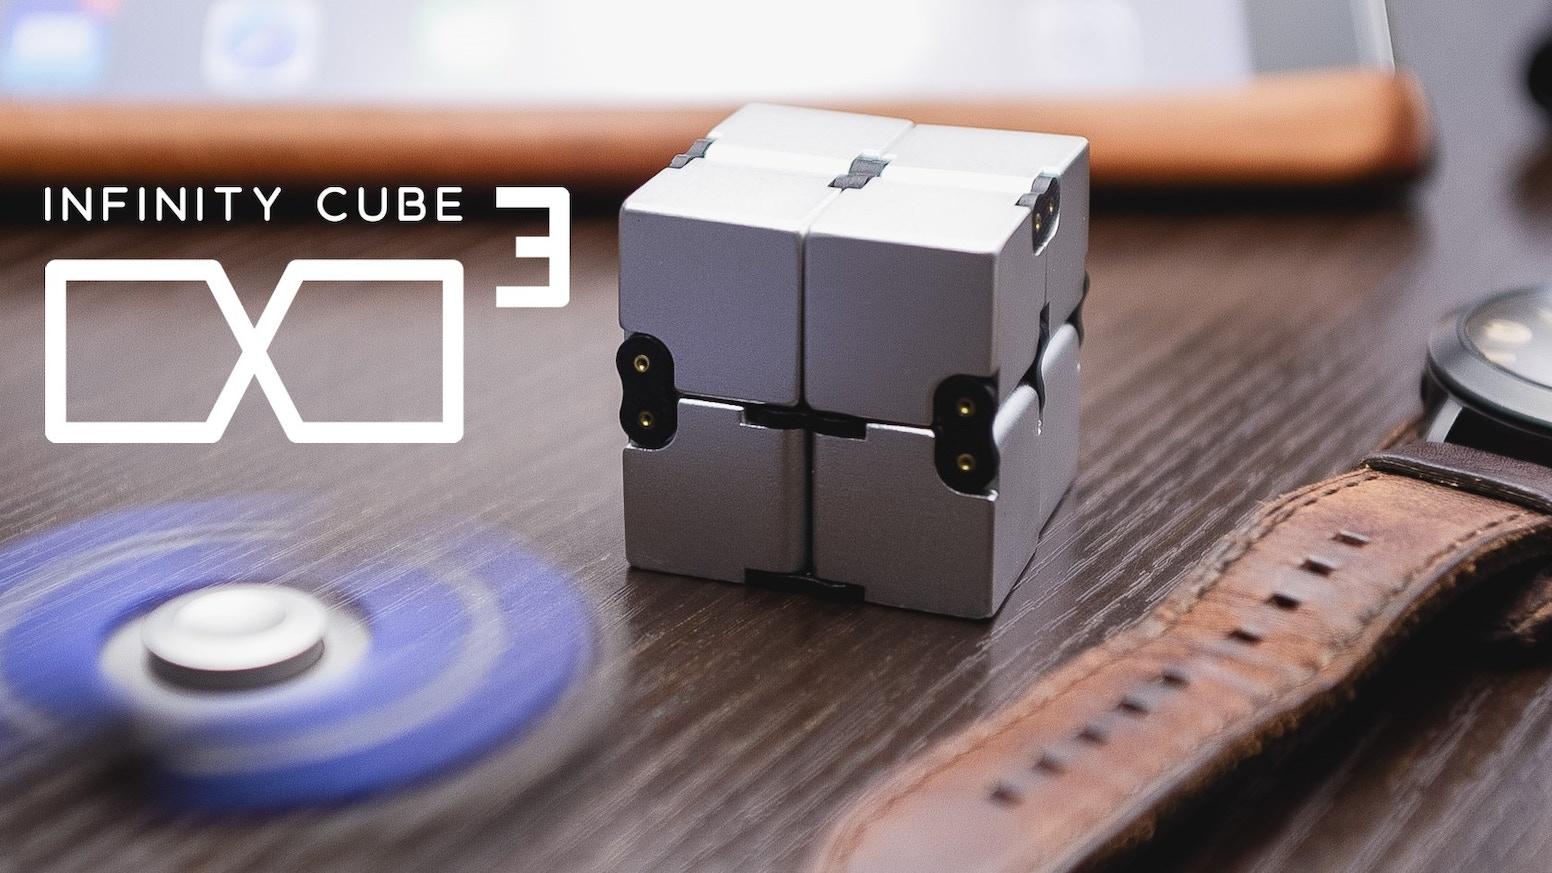 Fidget in Style with INFINITY CUBE - Luxury EDC Fidgeting by ...